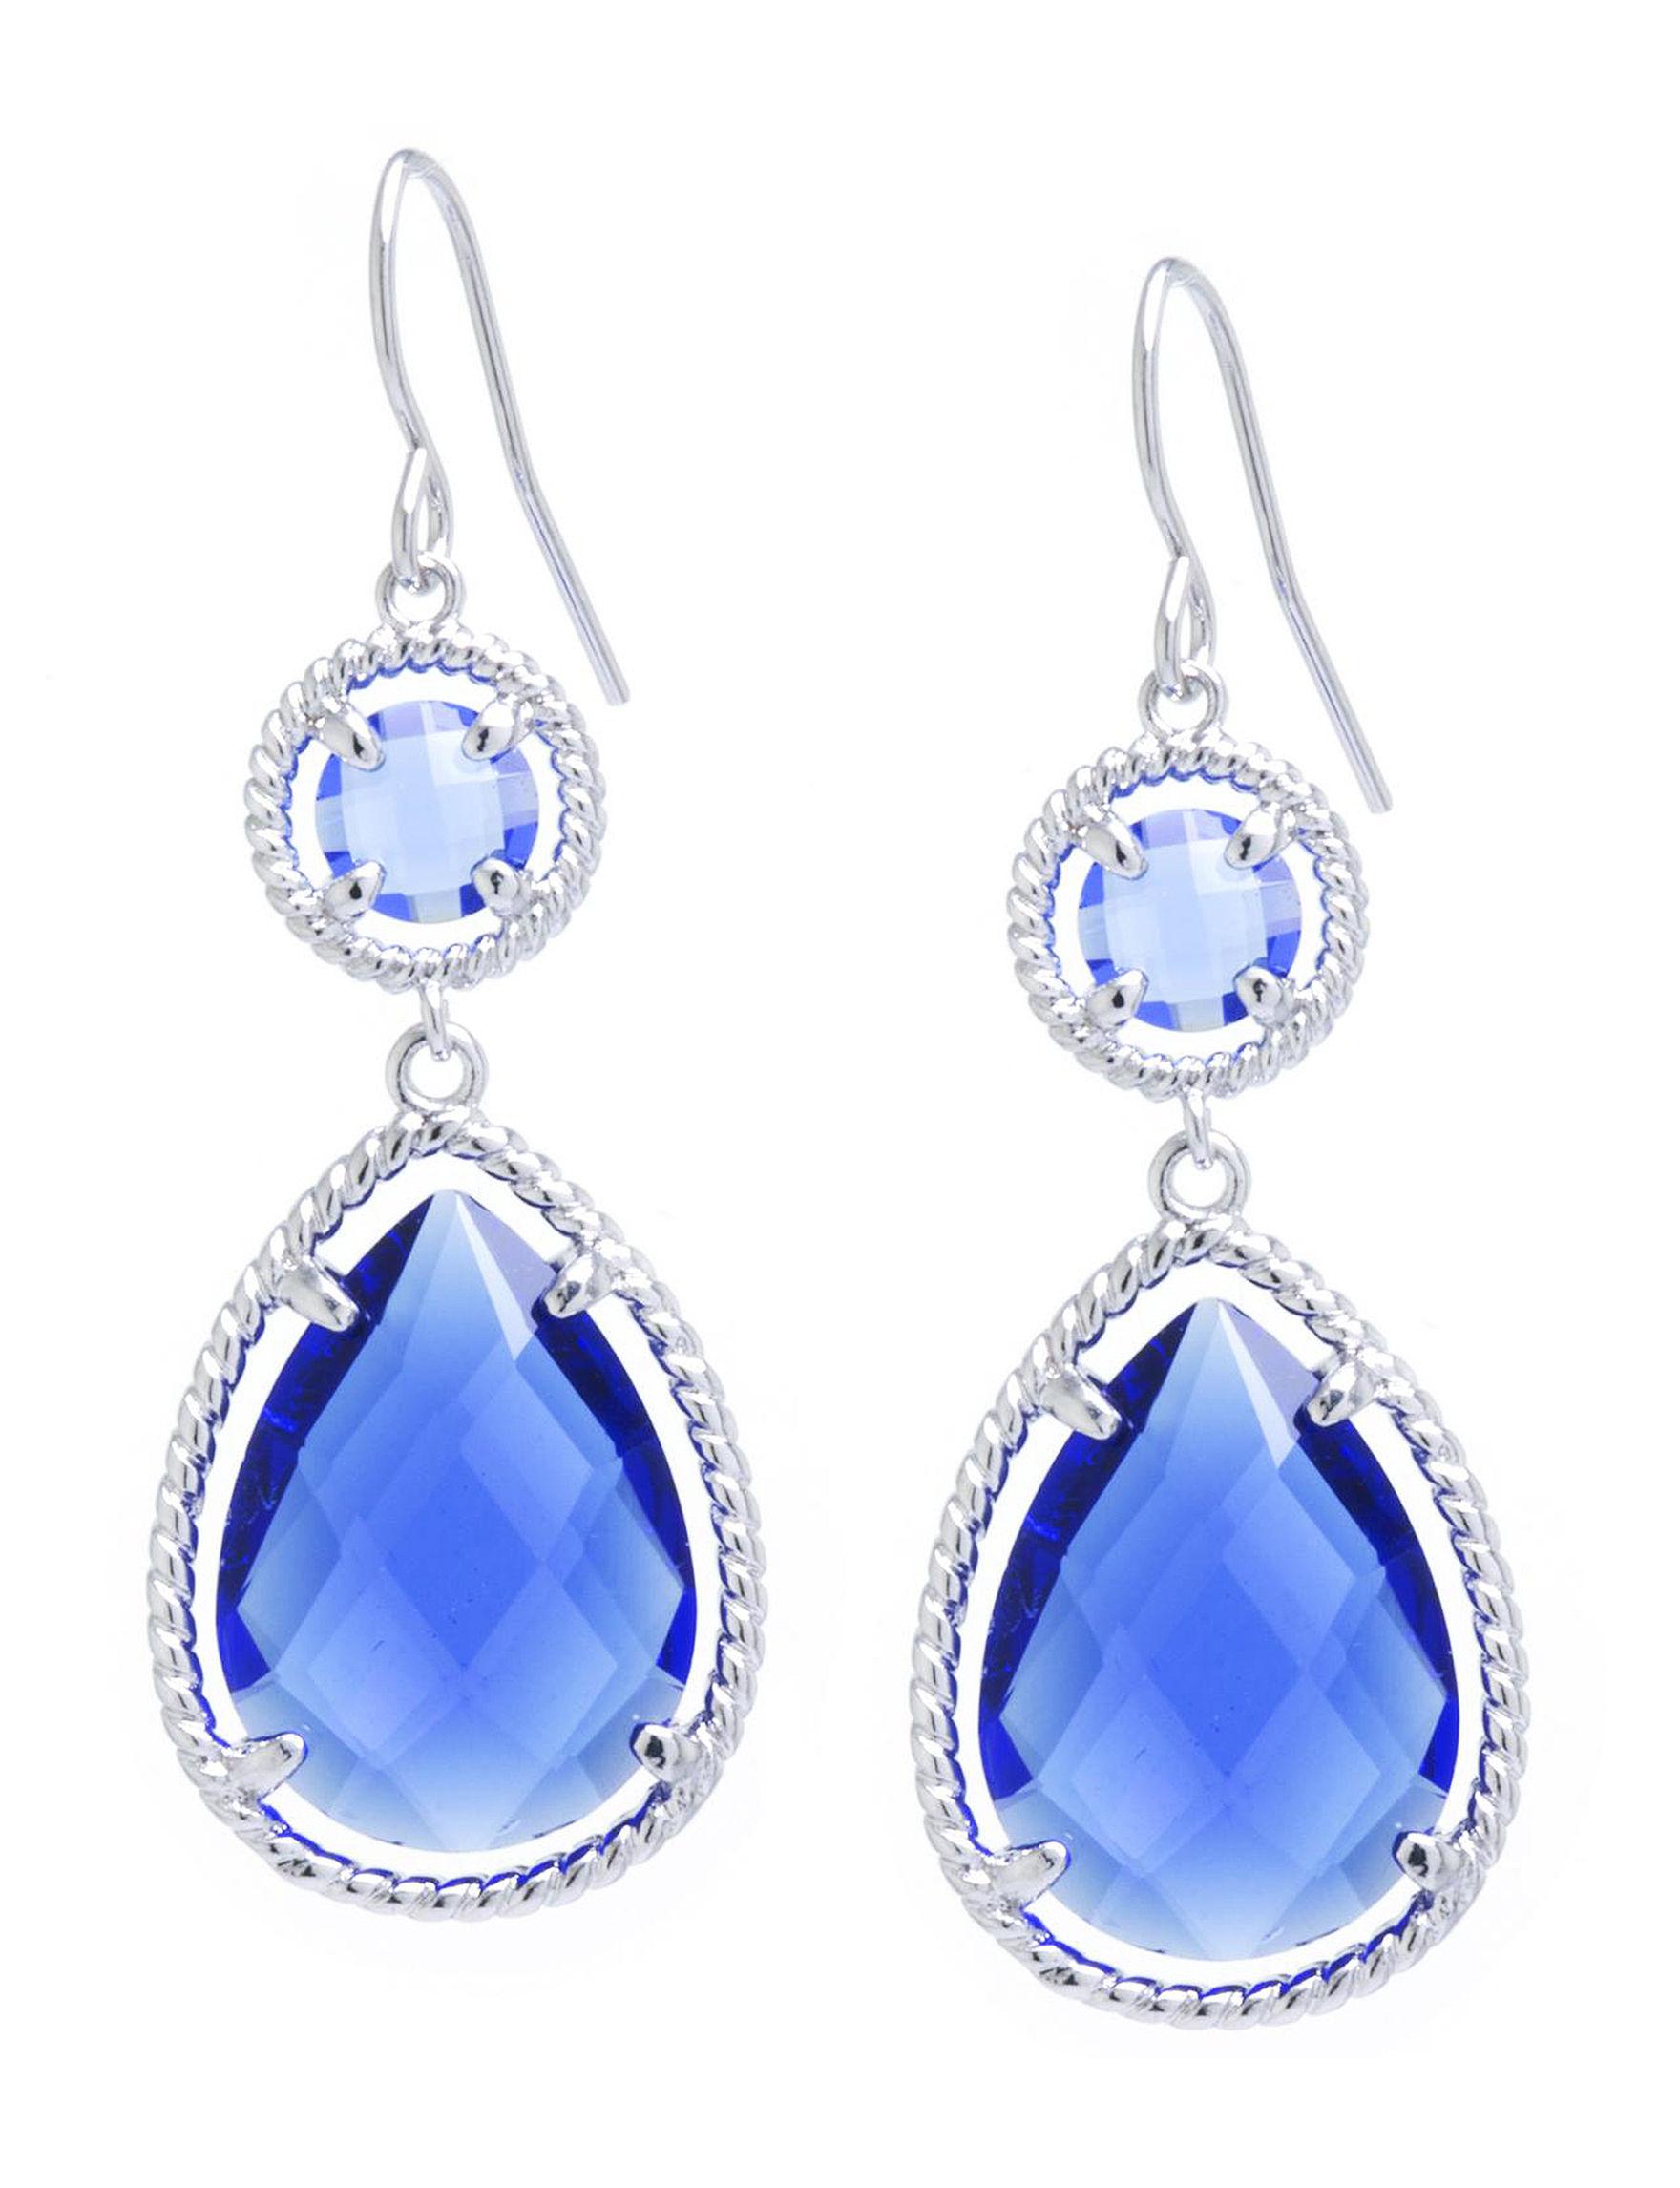 Athra Silver / Blue Stone Drops Earrings Fine Jewelry